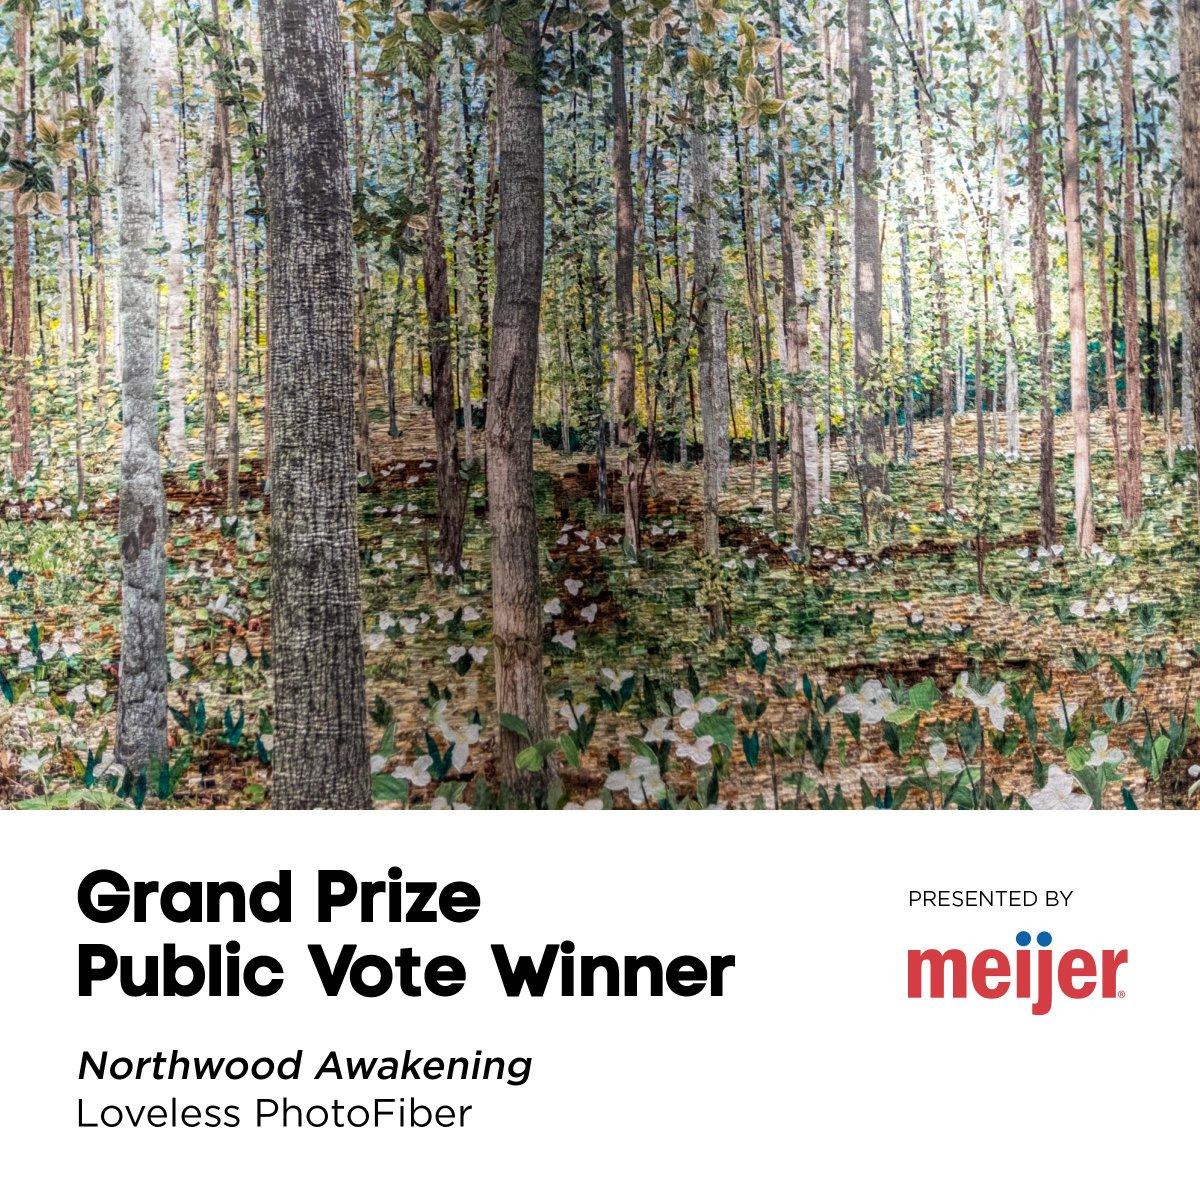 The winner of the #ArtPrize7 Public Vote $200,000 Grand Prize: http://t.co/f2Zgv40xVD